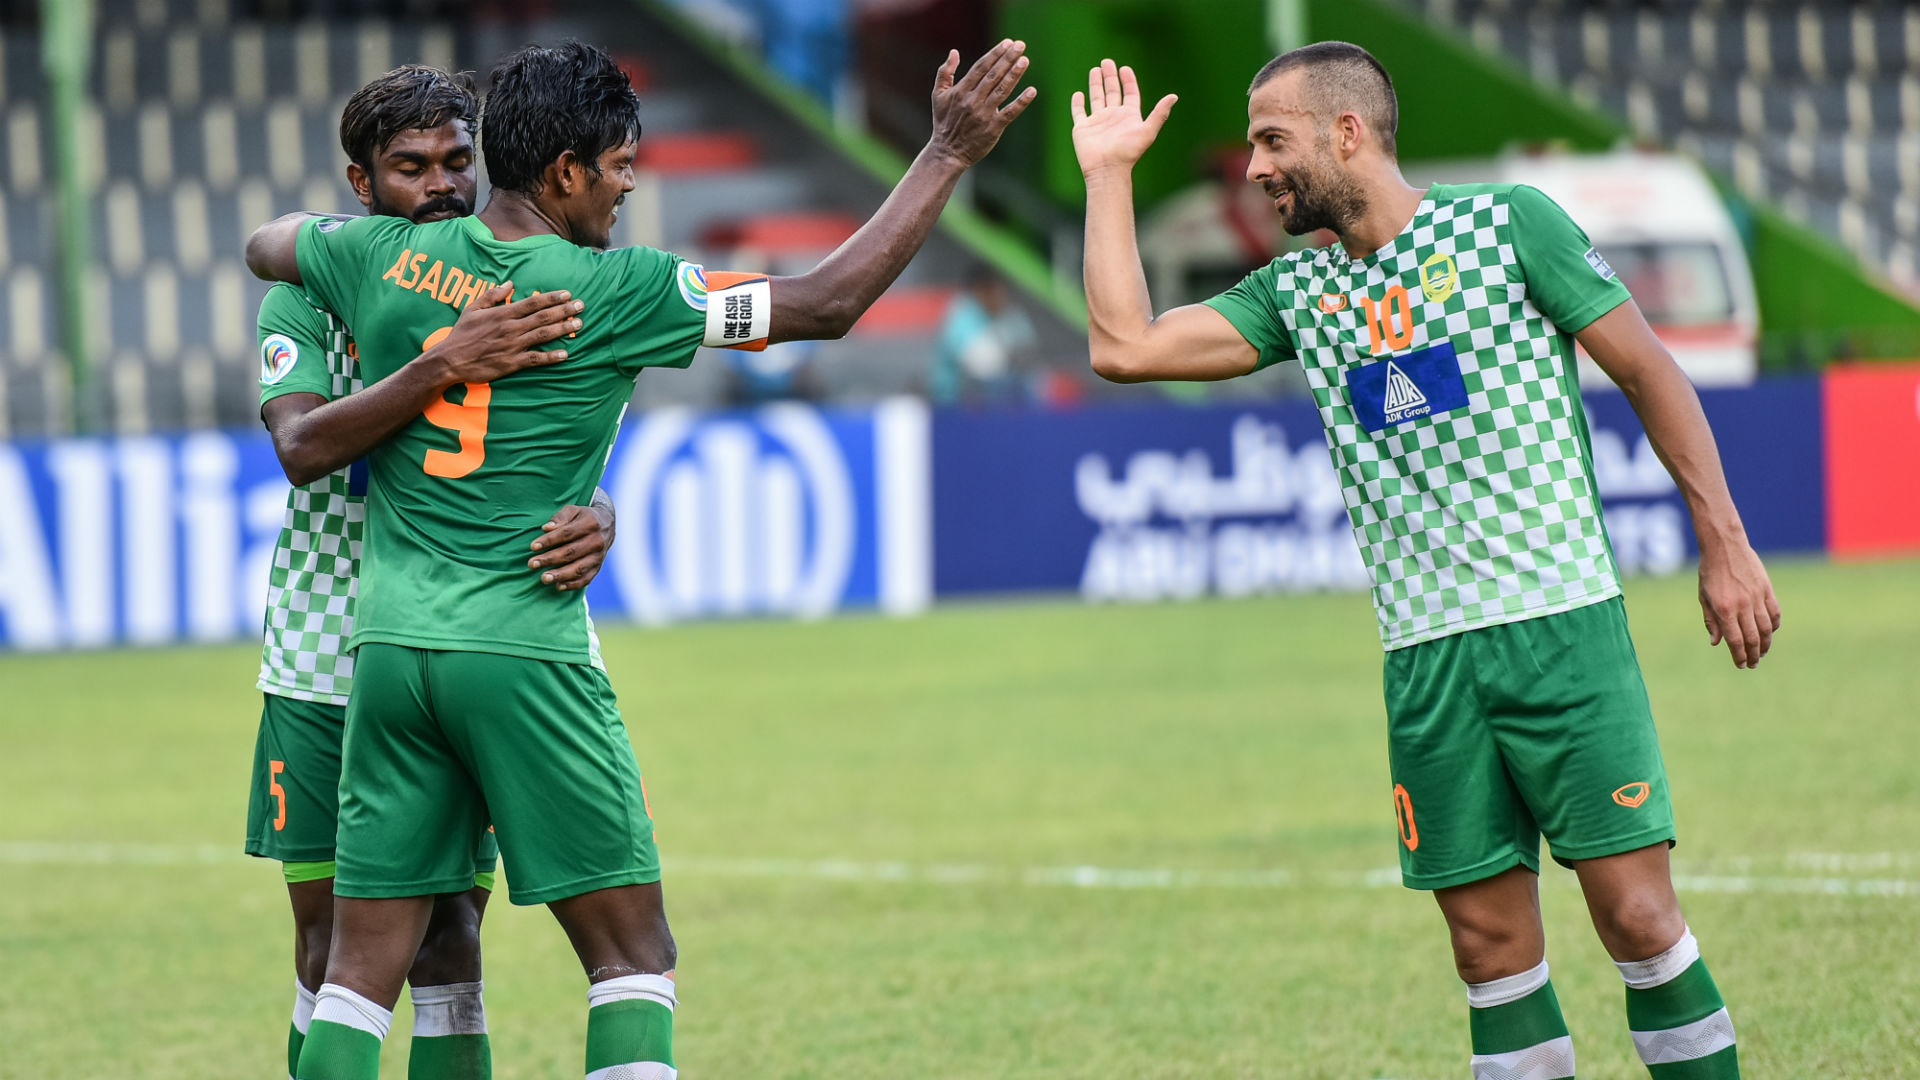 Maziya Mohun Bagan AFC Cup Group Stage 2017